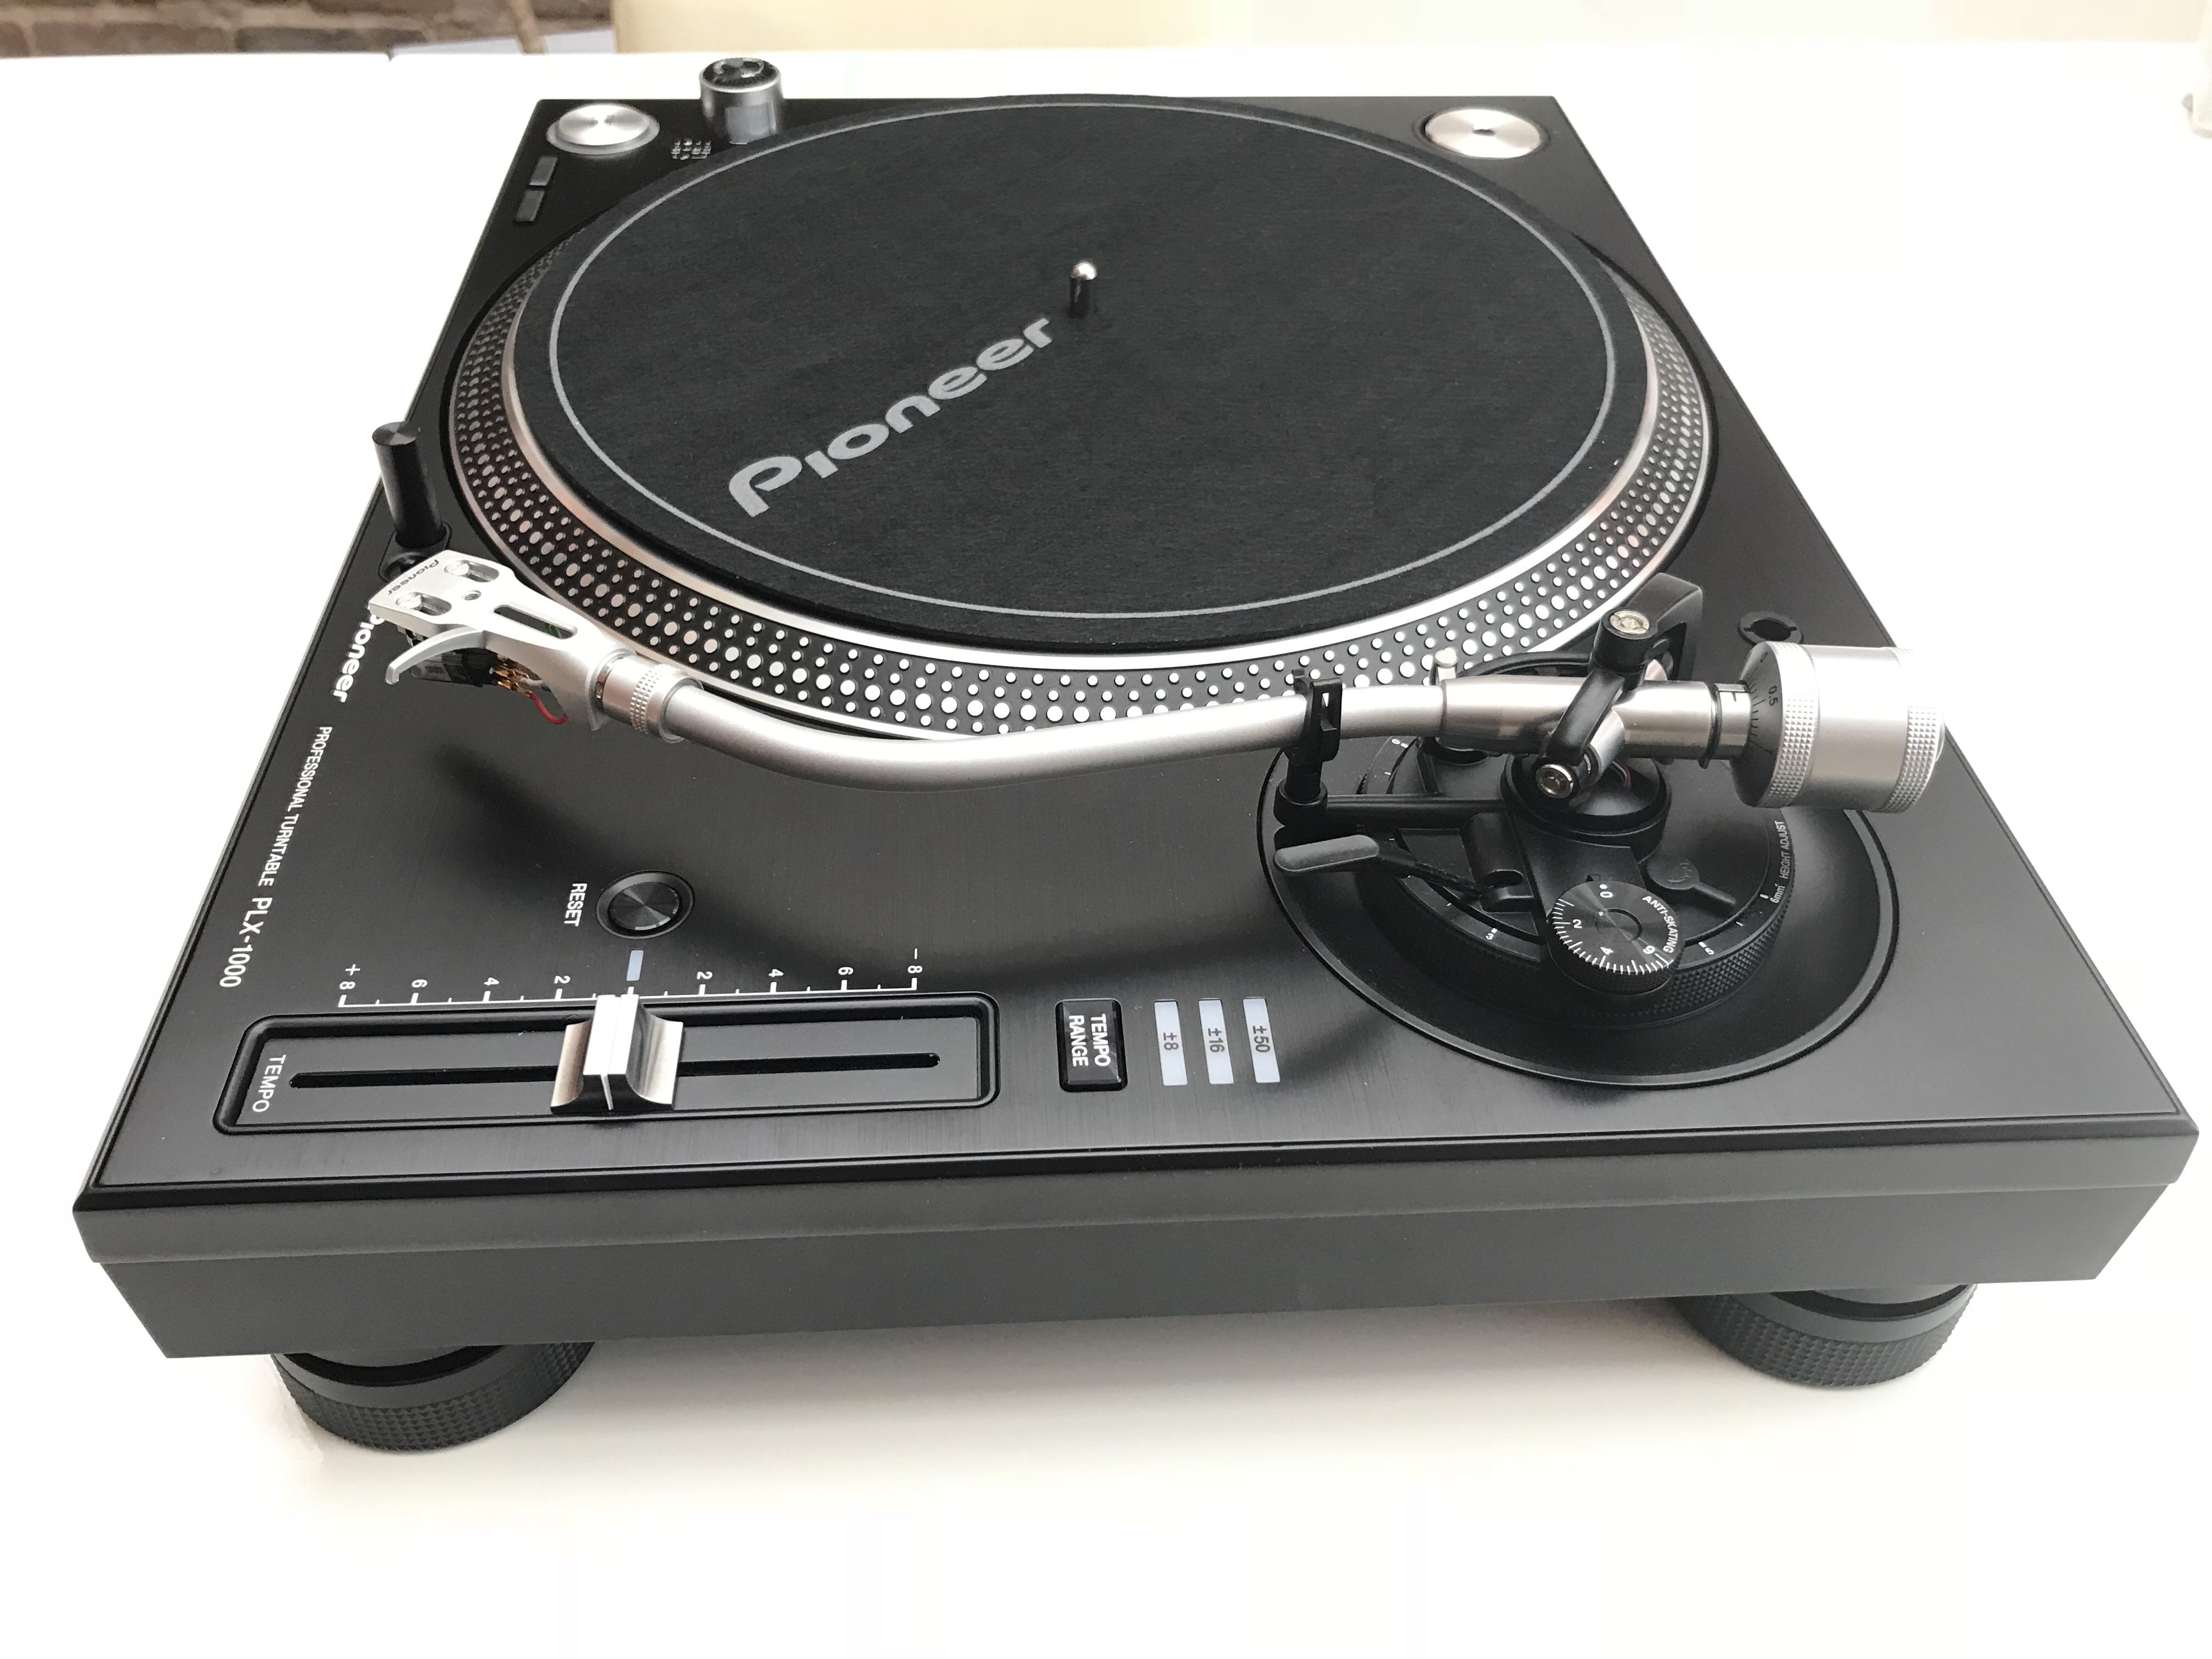 platine vinyle pioneer dj plx 1000 basse normandie audiofanzine. Black Bedroom Furniture Sets. Home Design Ideas